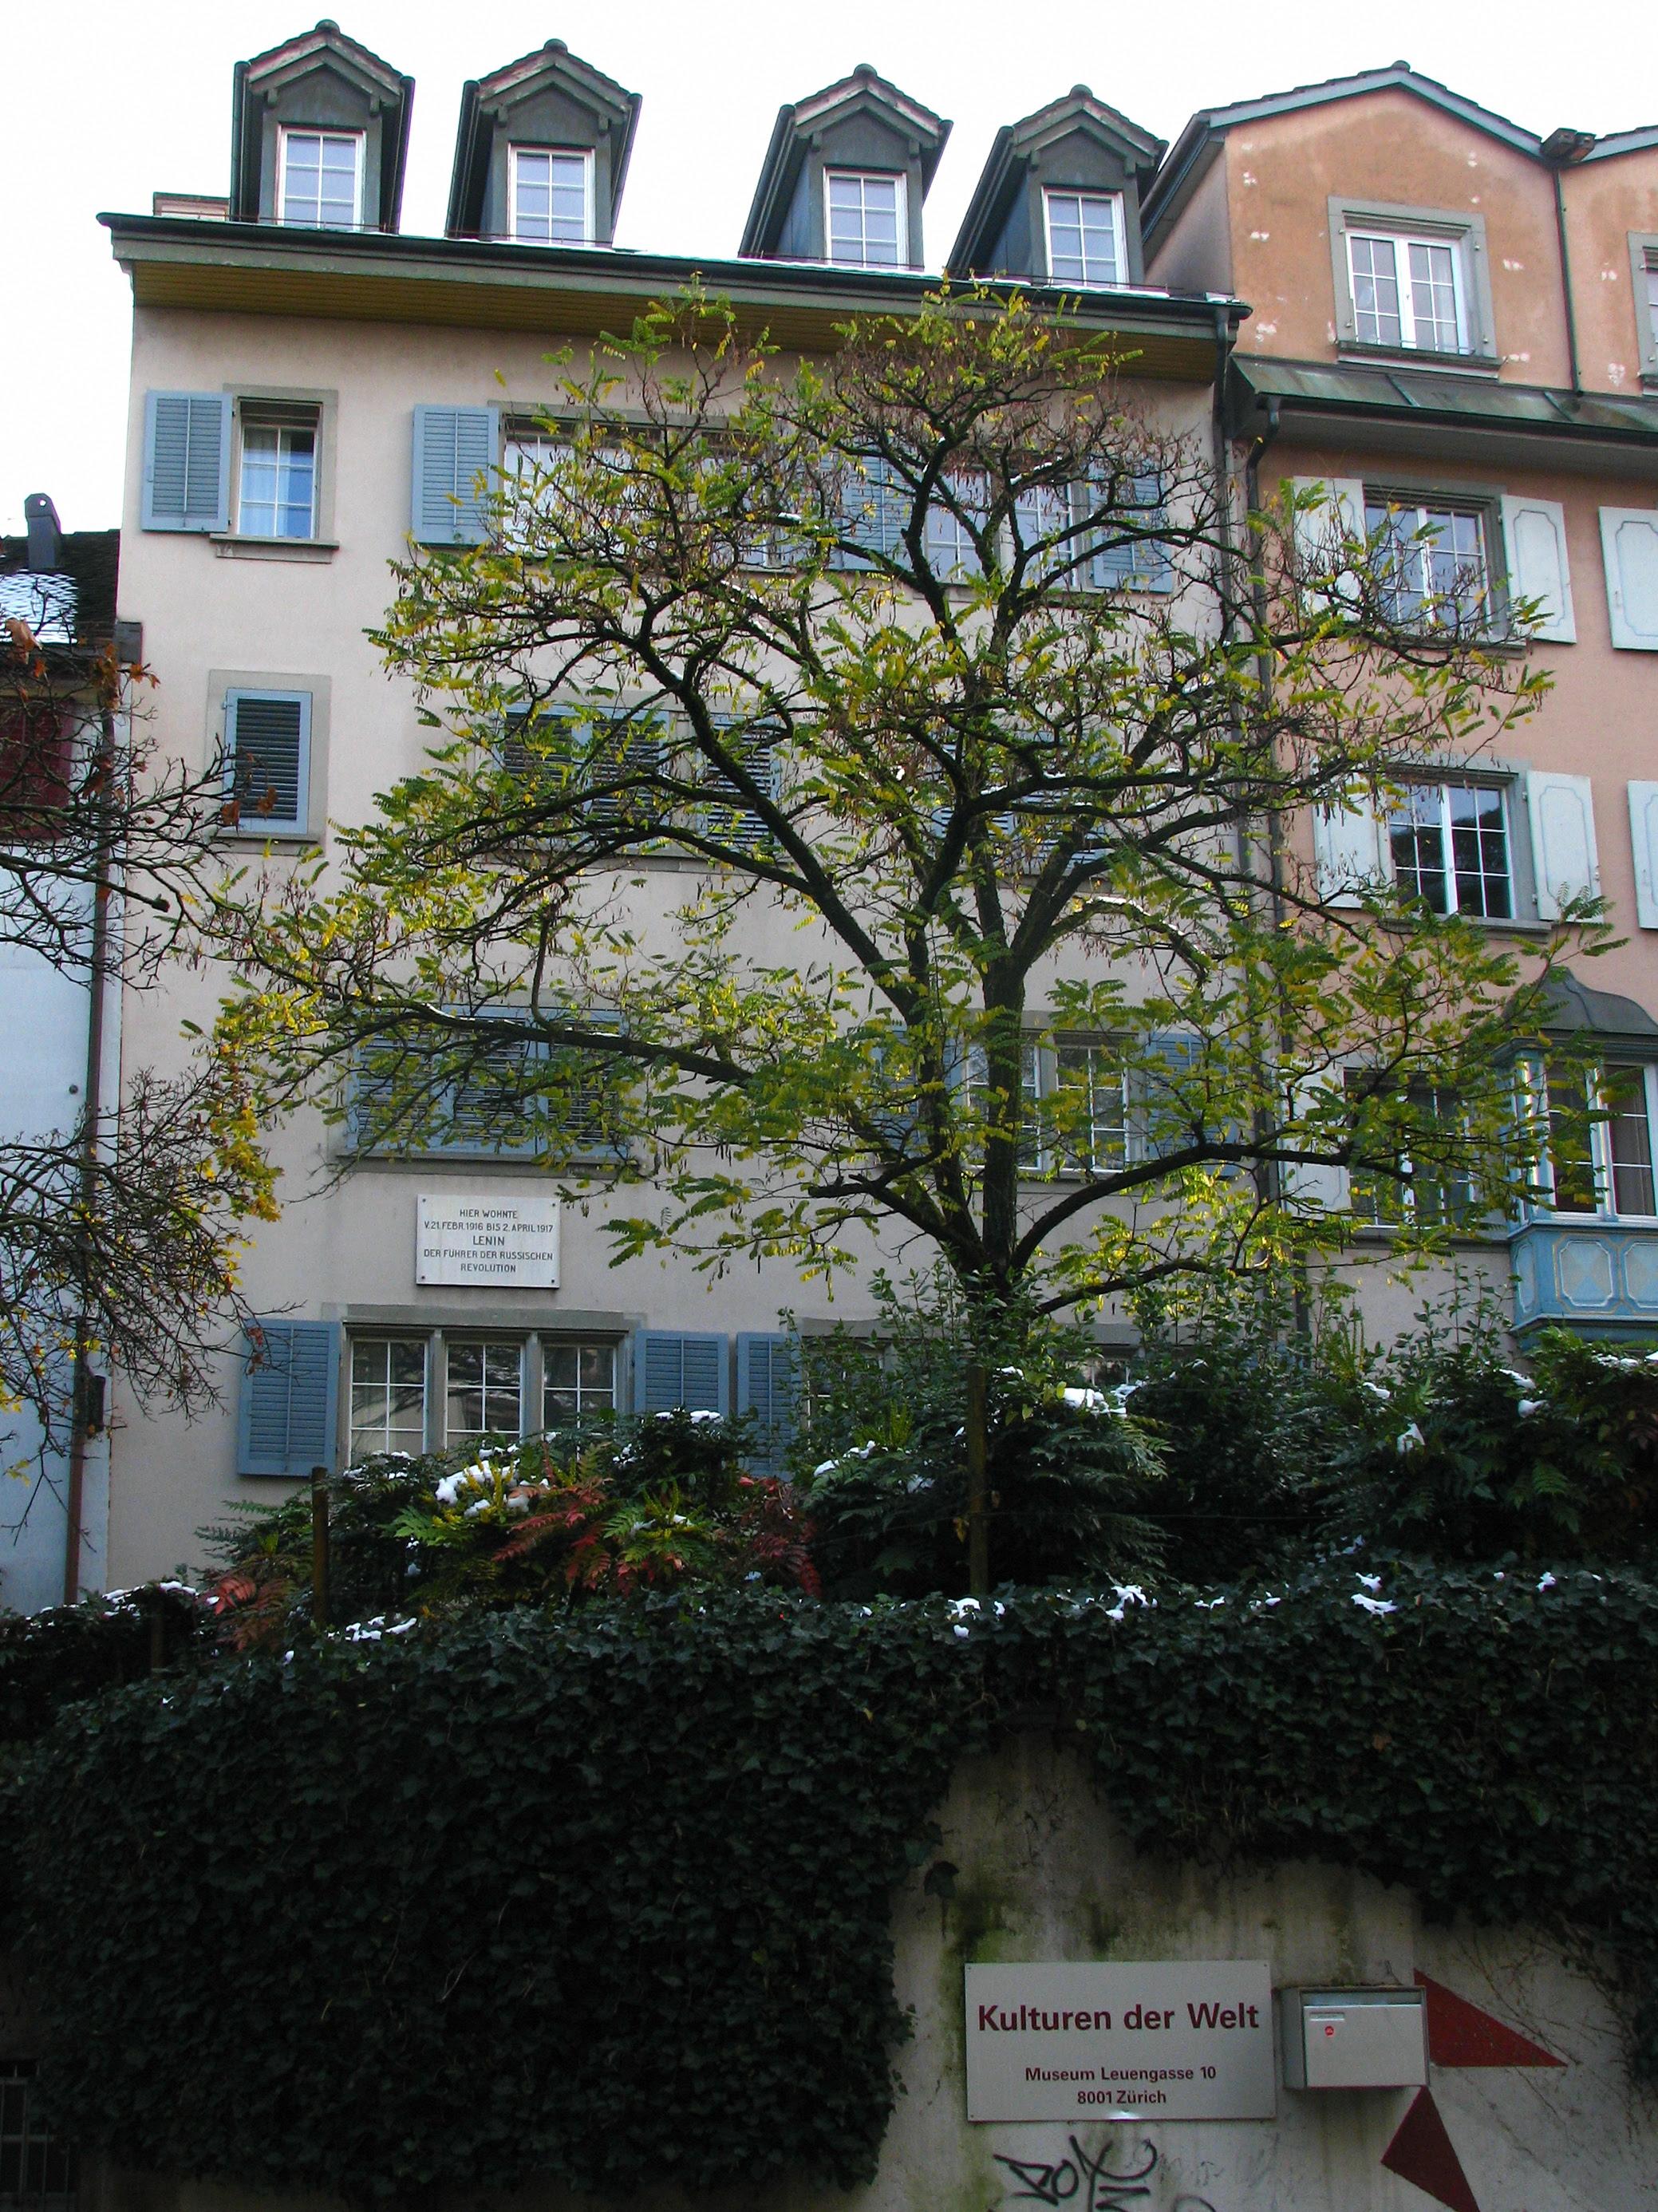 Where Lenin lived in Zürich